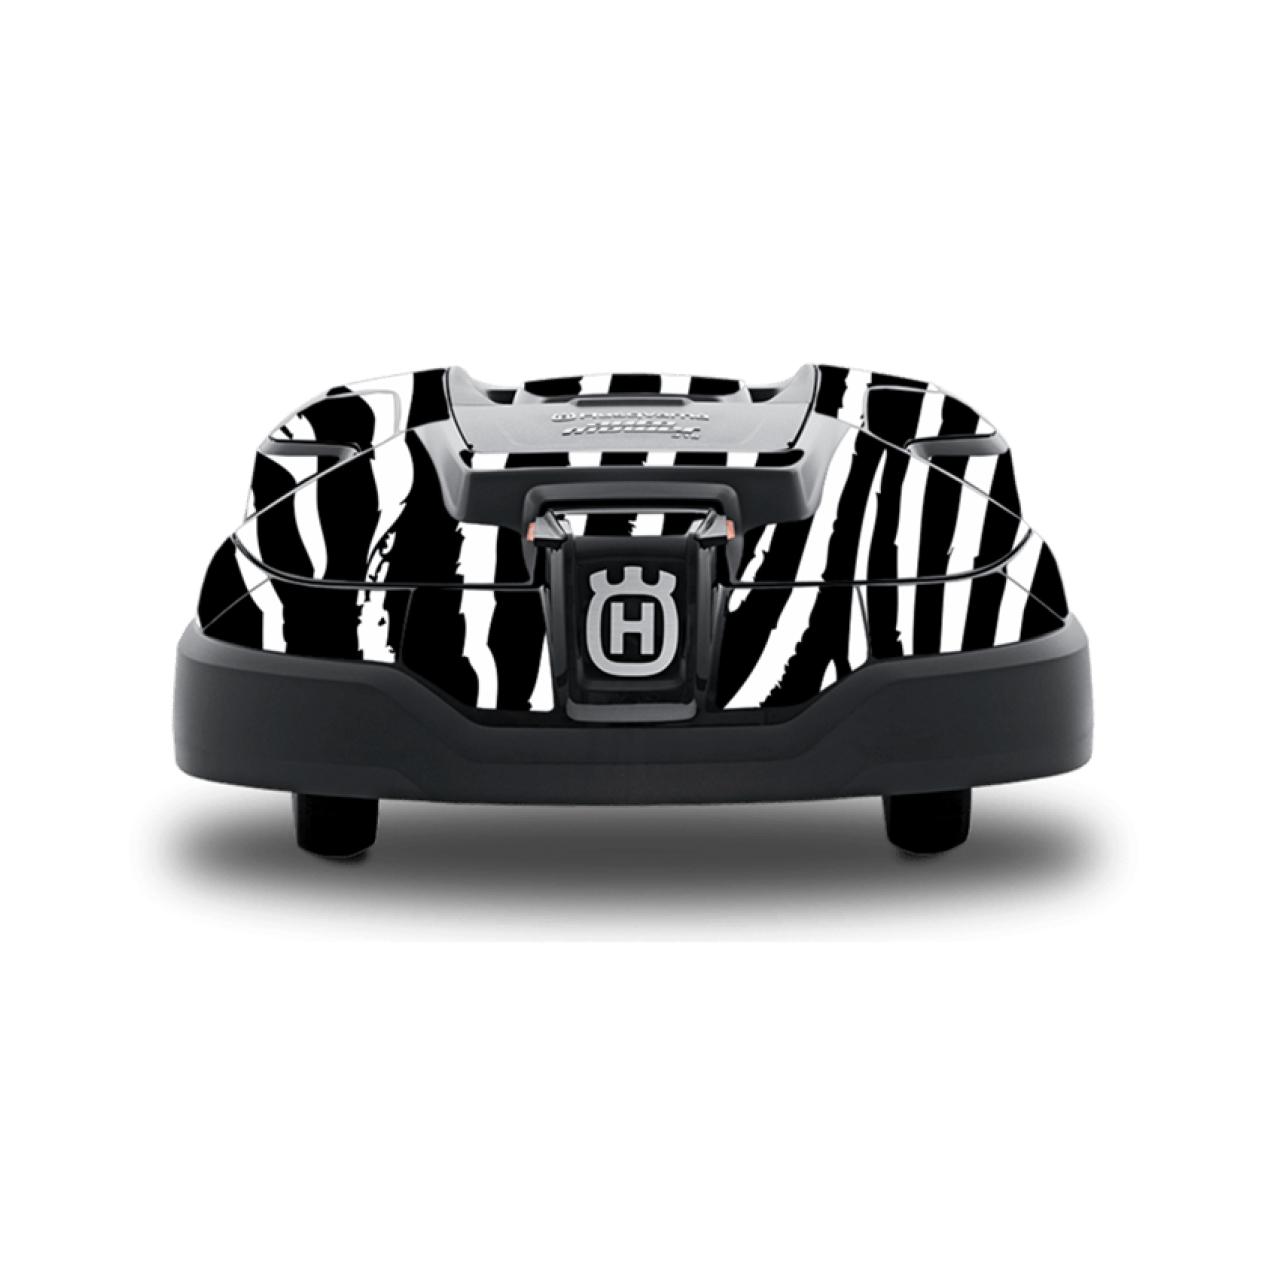 Sticker-Set Zebra (310/315)